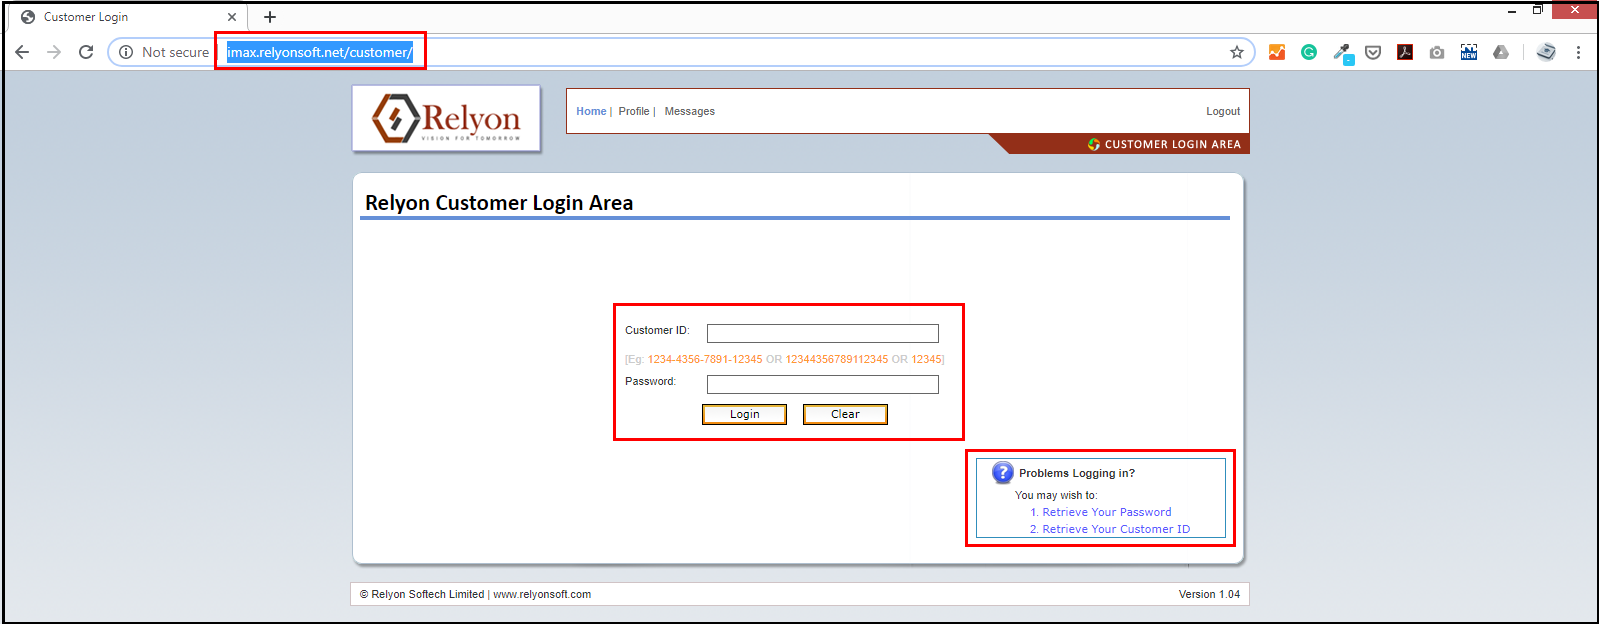 1.Procedure for software update in Saral TDS-customer portal.